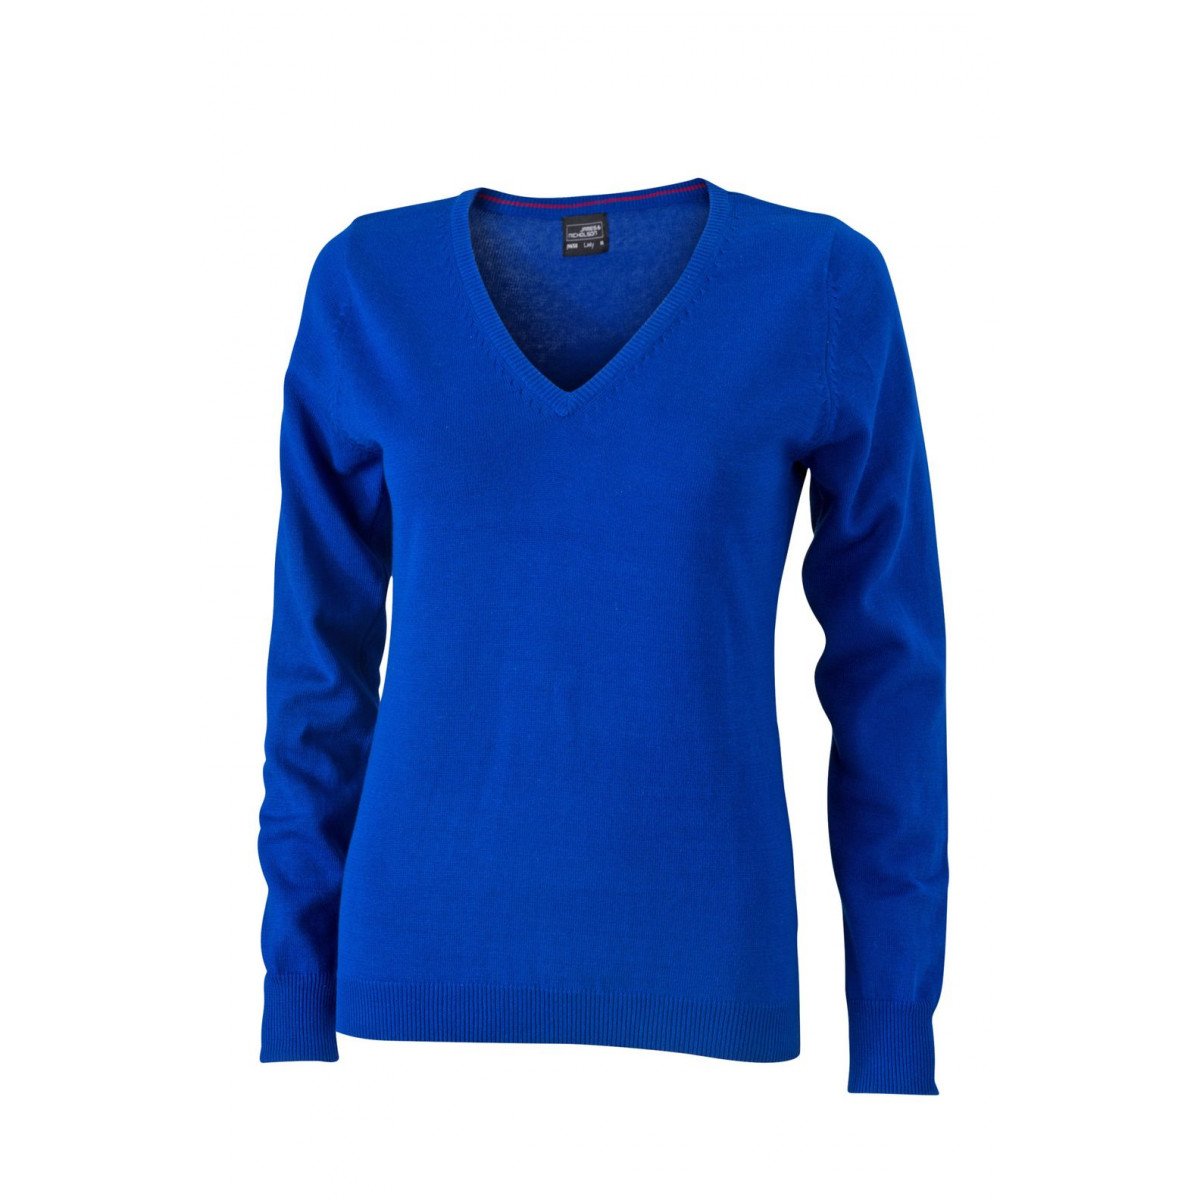 Пуловер женский JN658 Ladies V-Neck Pullover - Ярко-синий